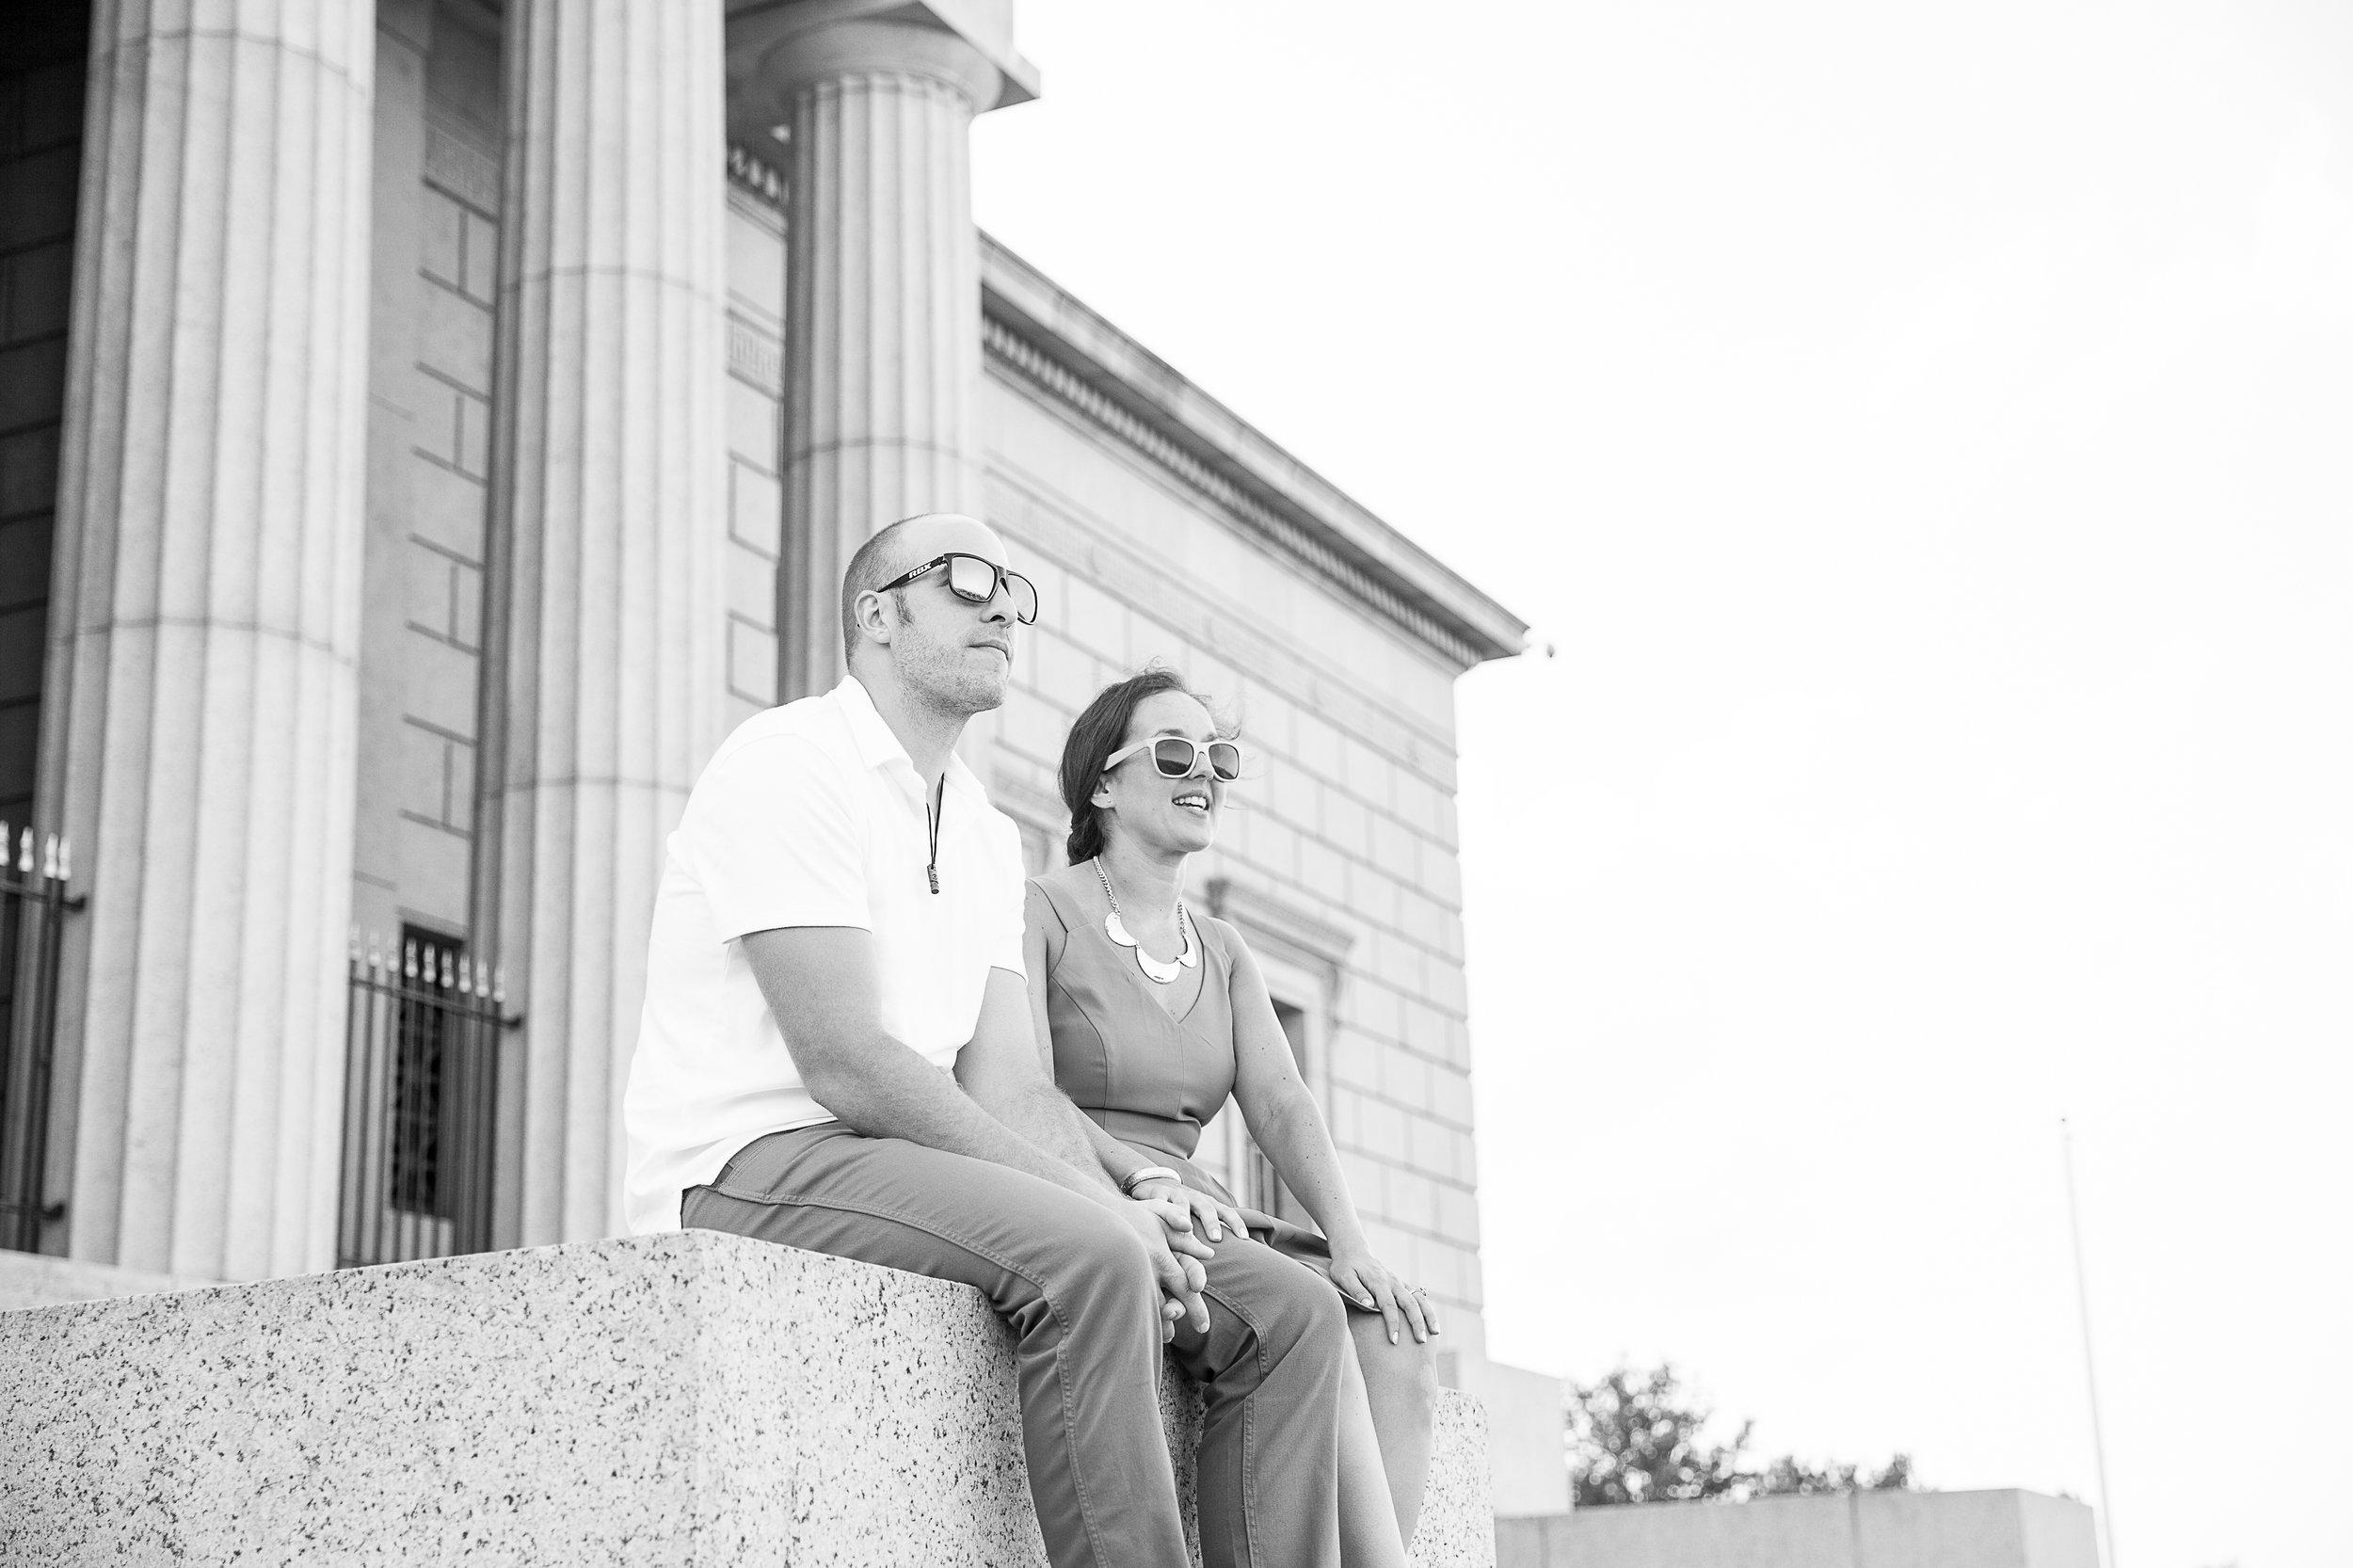 Marissa-Timon-Engagement-Kim-Pham-Clark-Photography-05.jpg